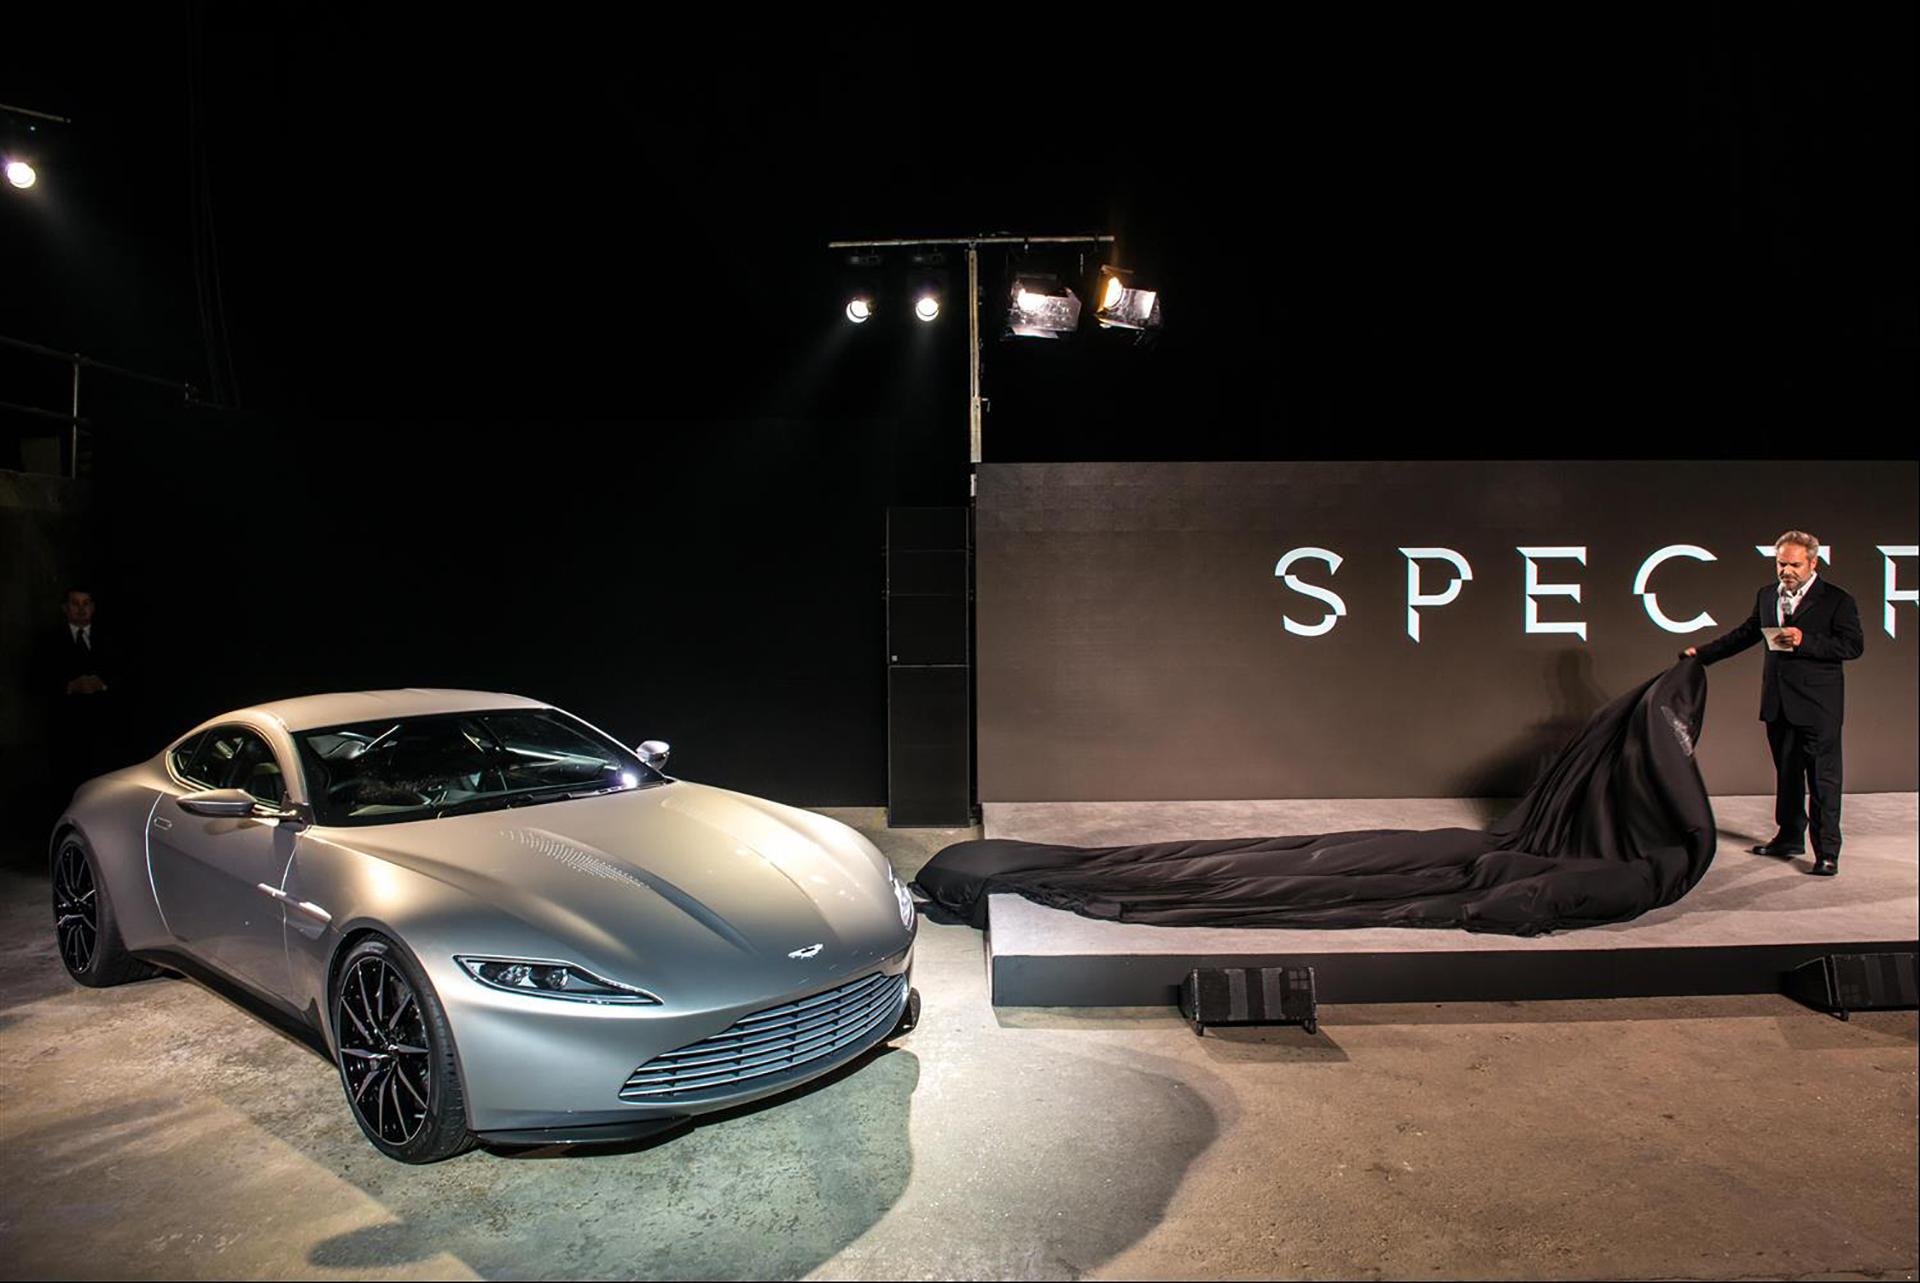 Aston Martin DB10 - Spectre - Announcement 2014